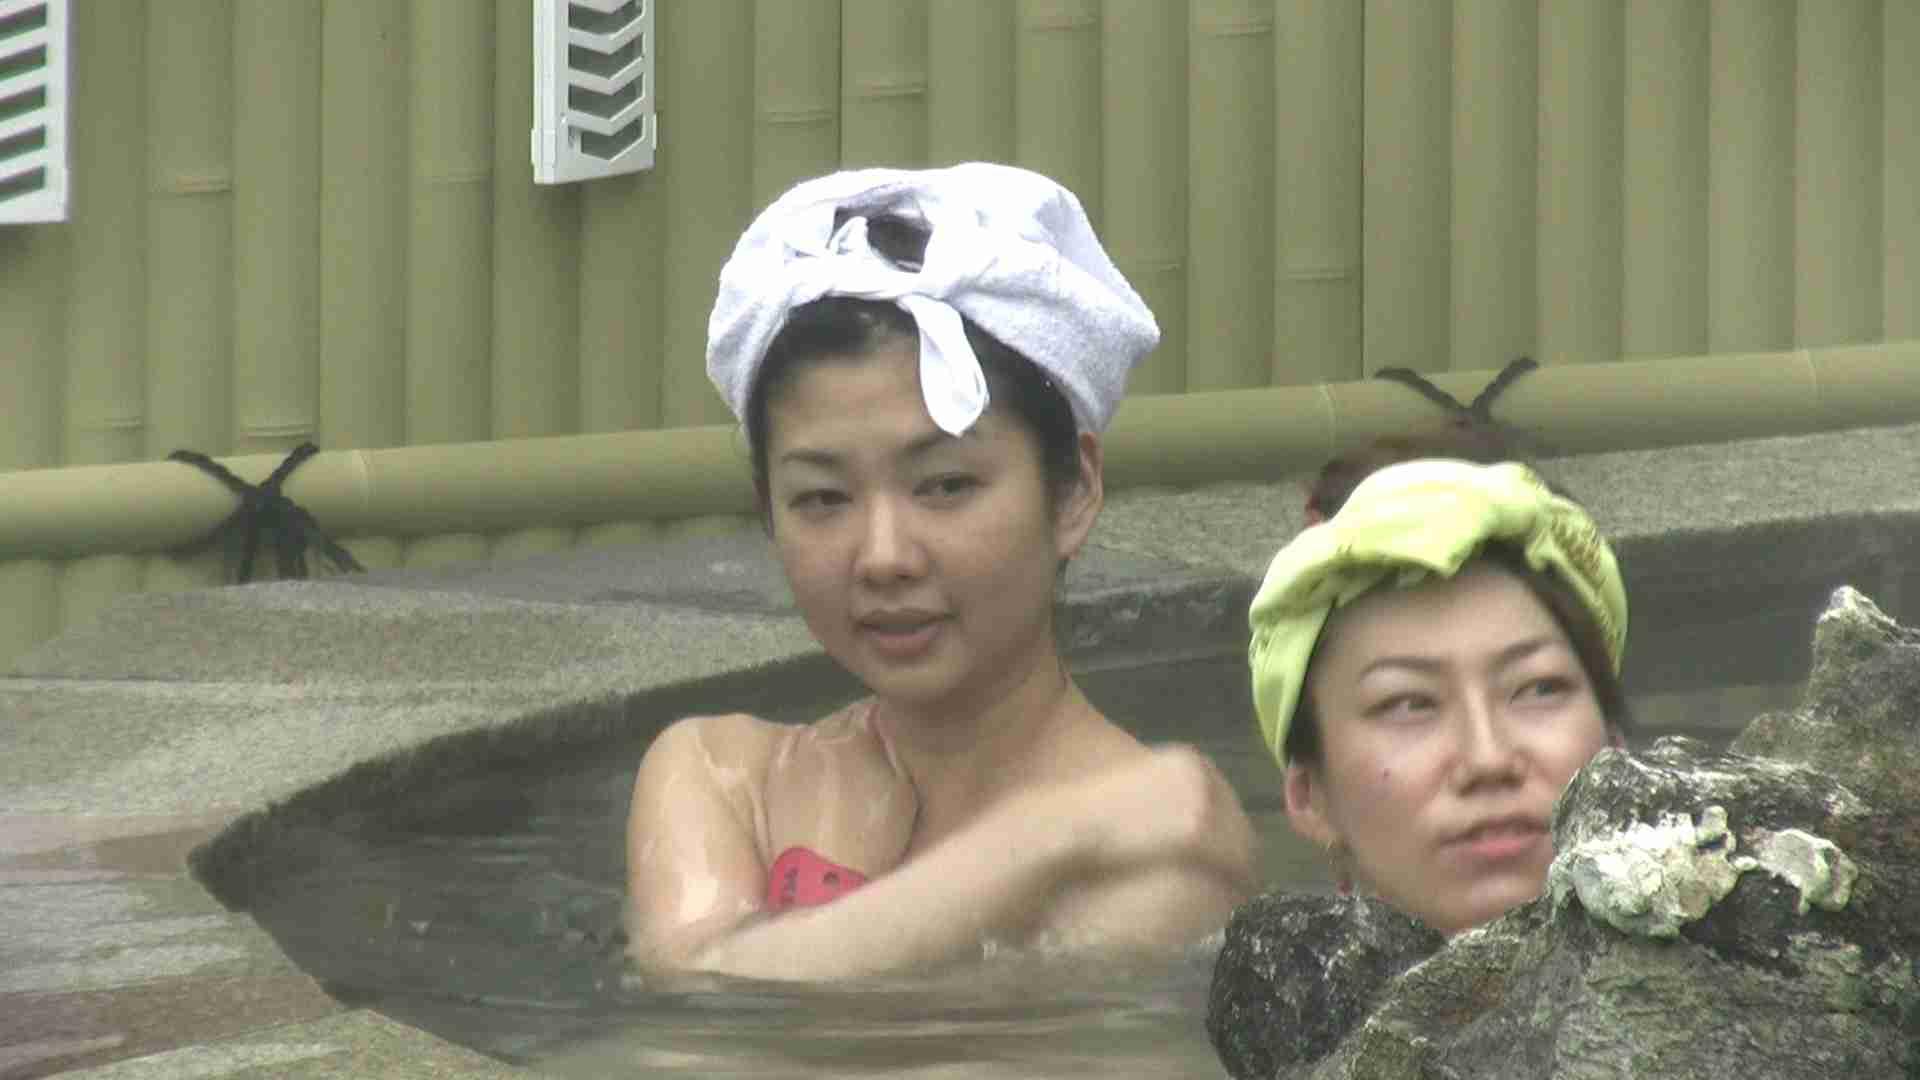 Aquaな露天風呂Vol.192 露天風呂 | OLのエロ生活  79連発 1